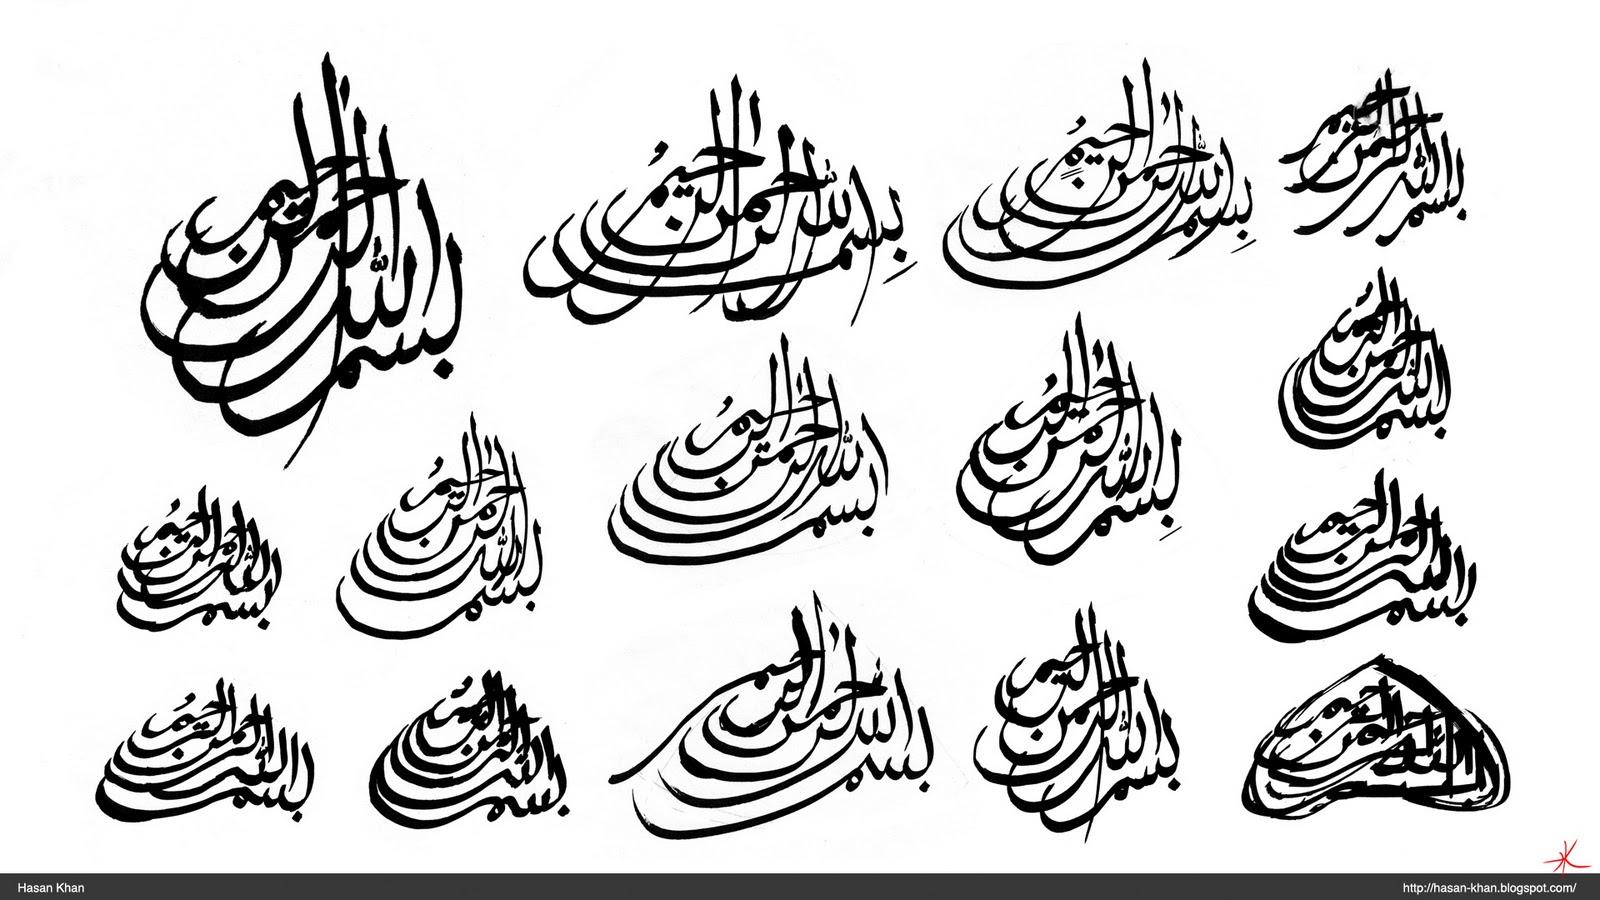 Arabic Writing Art Arabic calligraphyArabic Writing Art